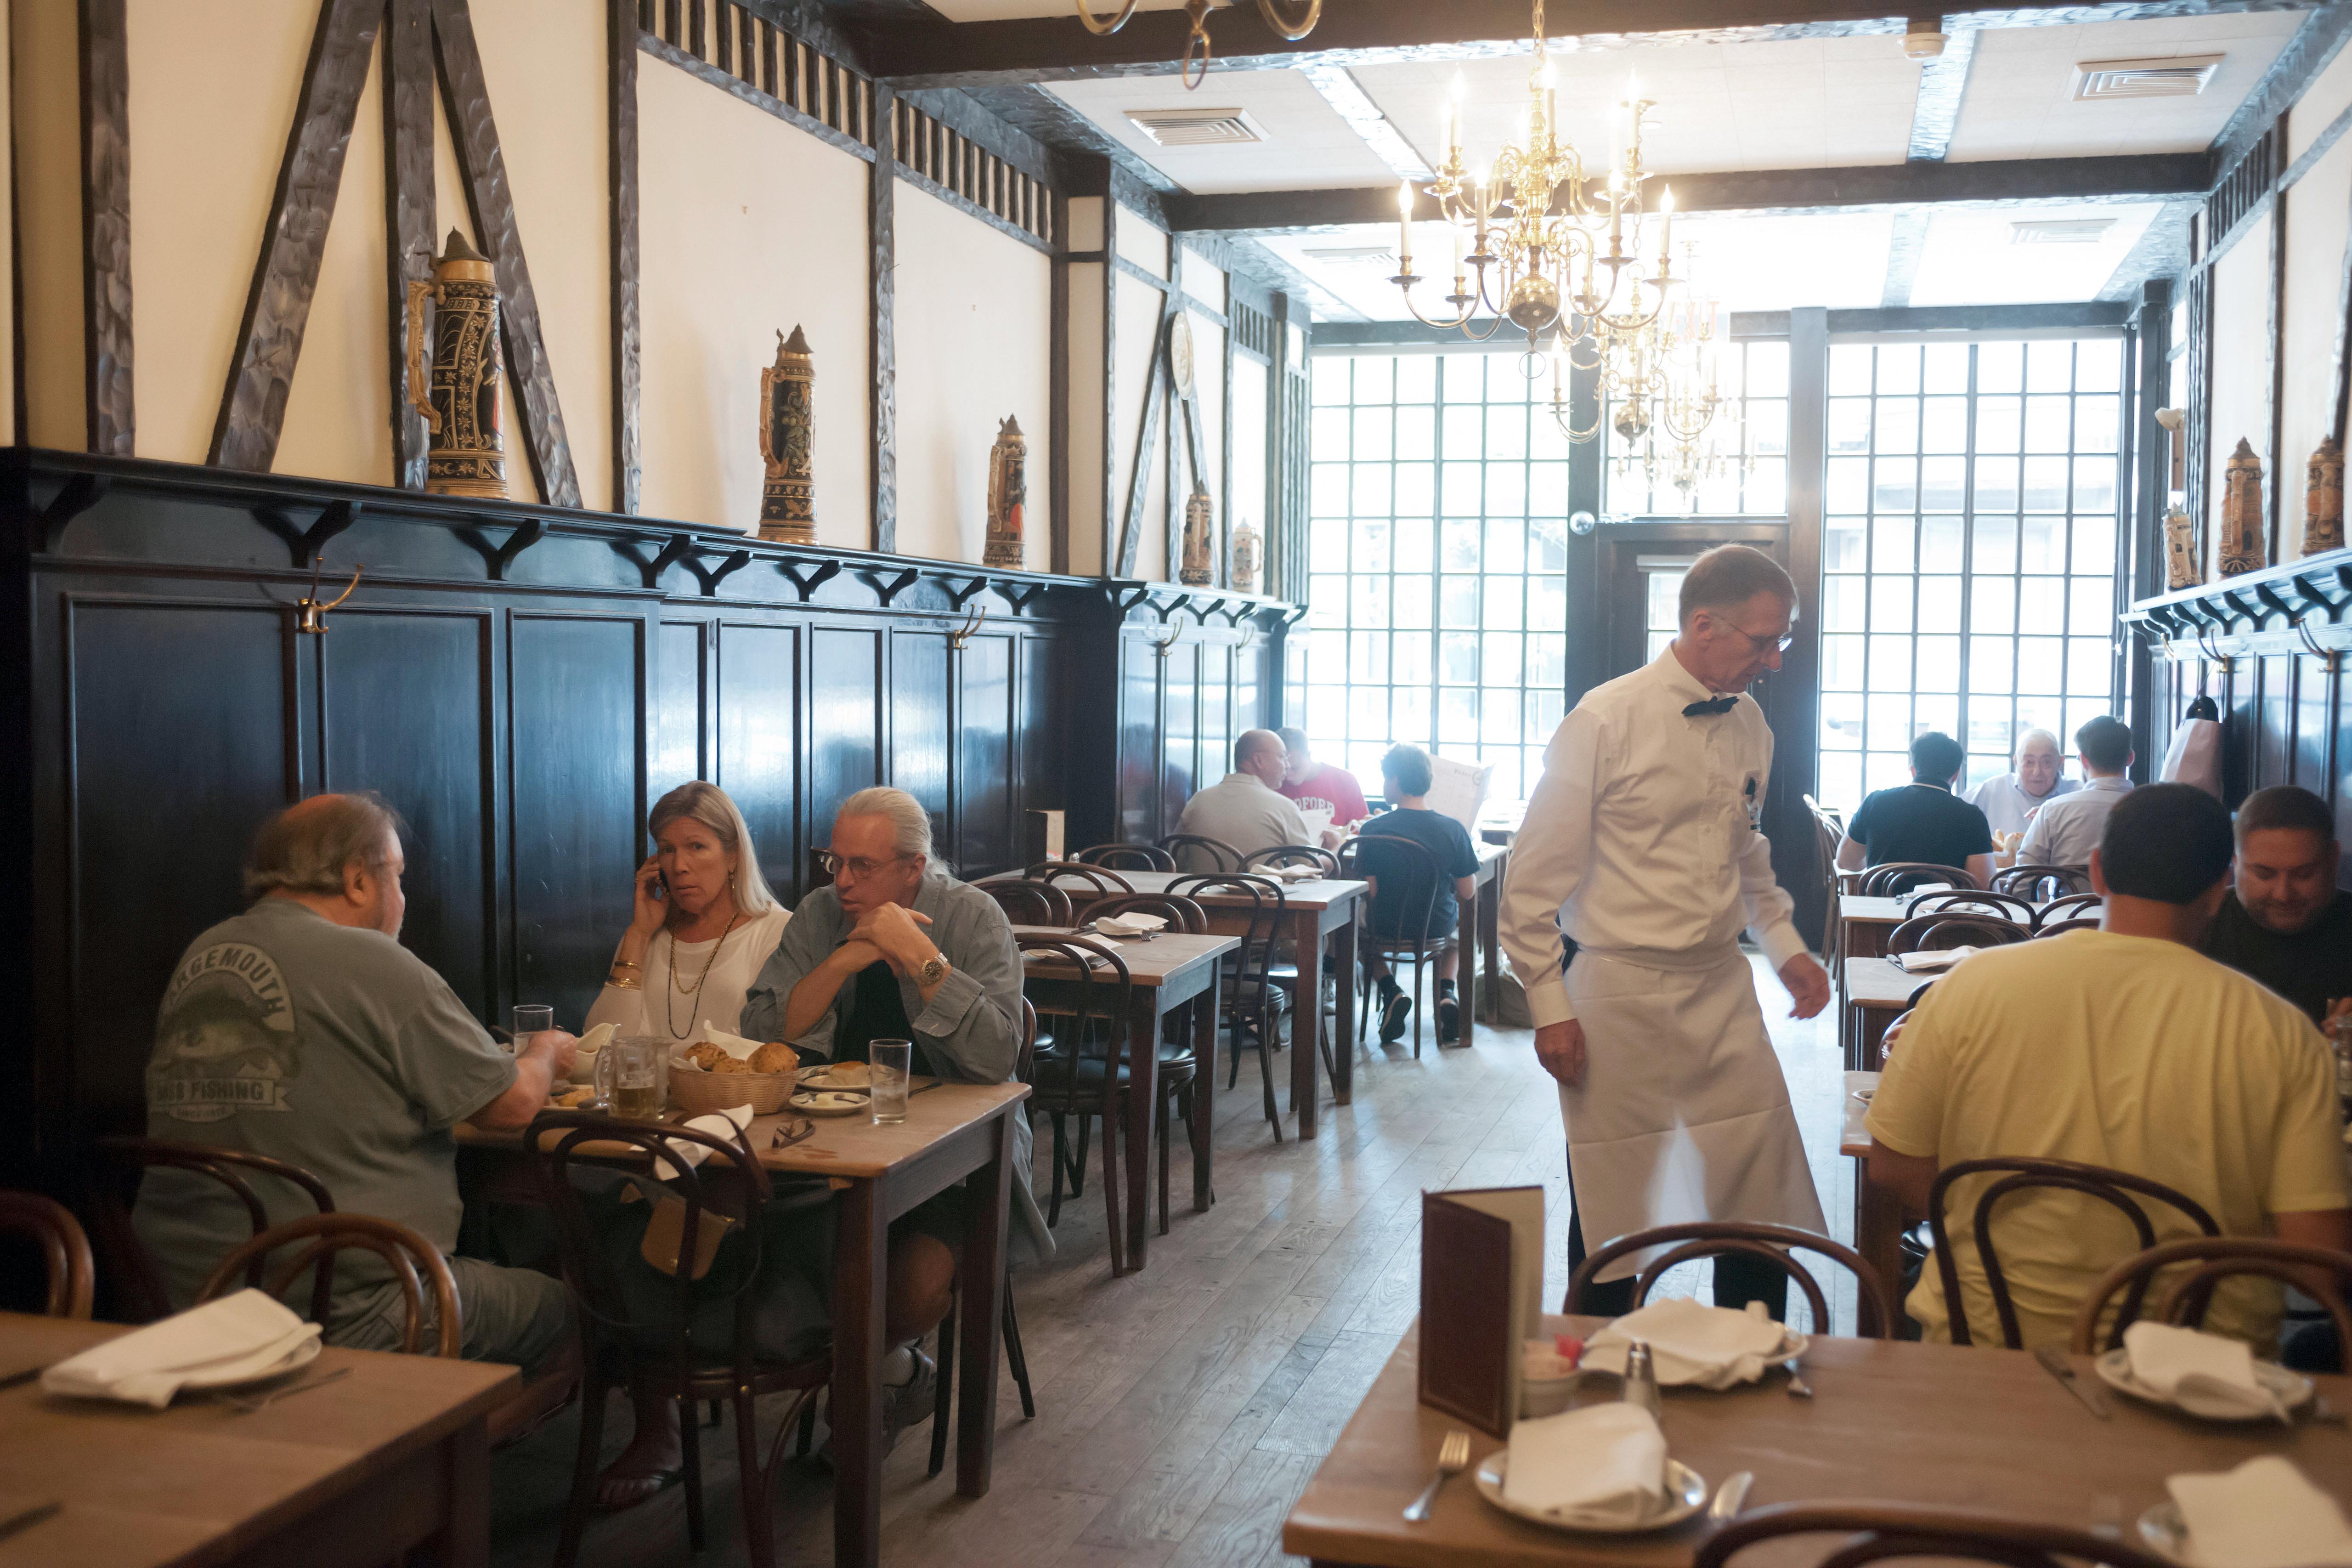 Peter Luger Steak House in Williamsburg, Brooklyn in New York